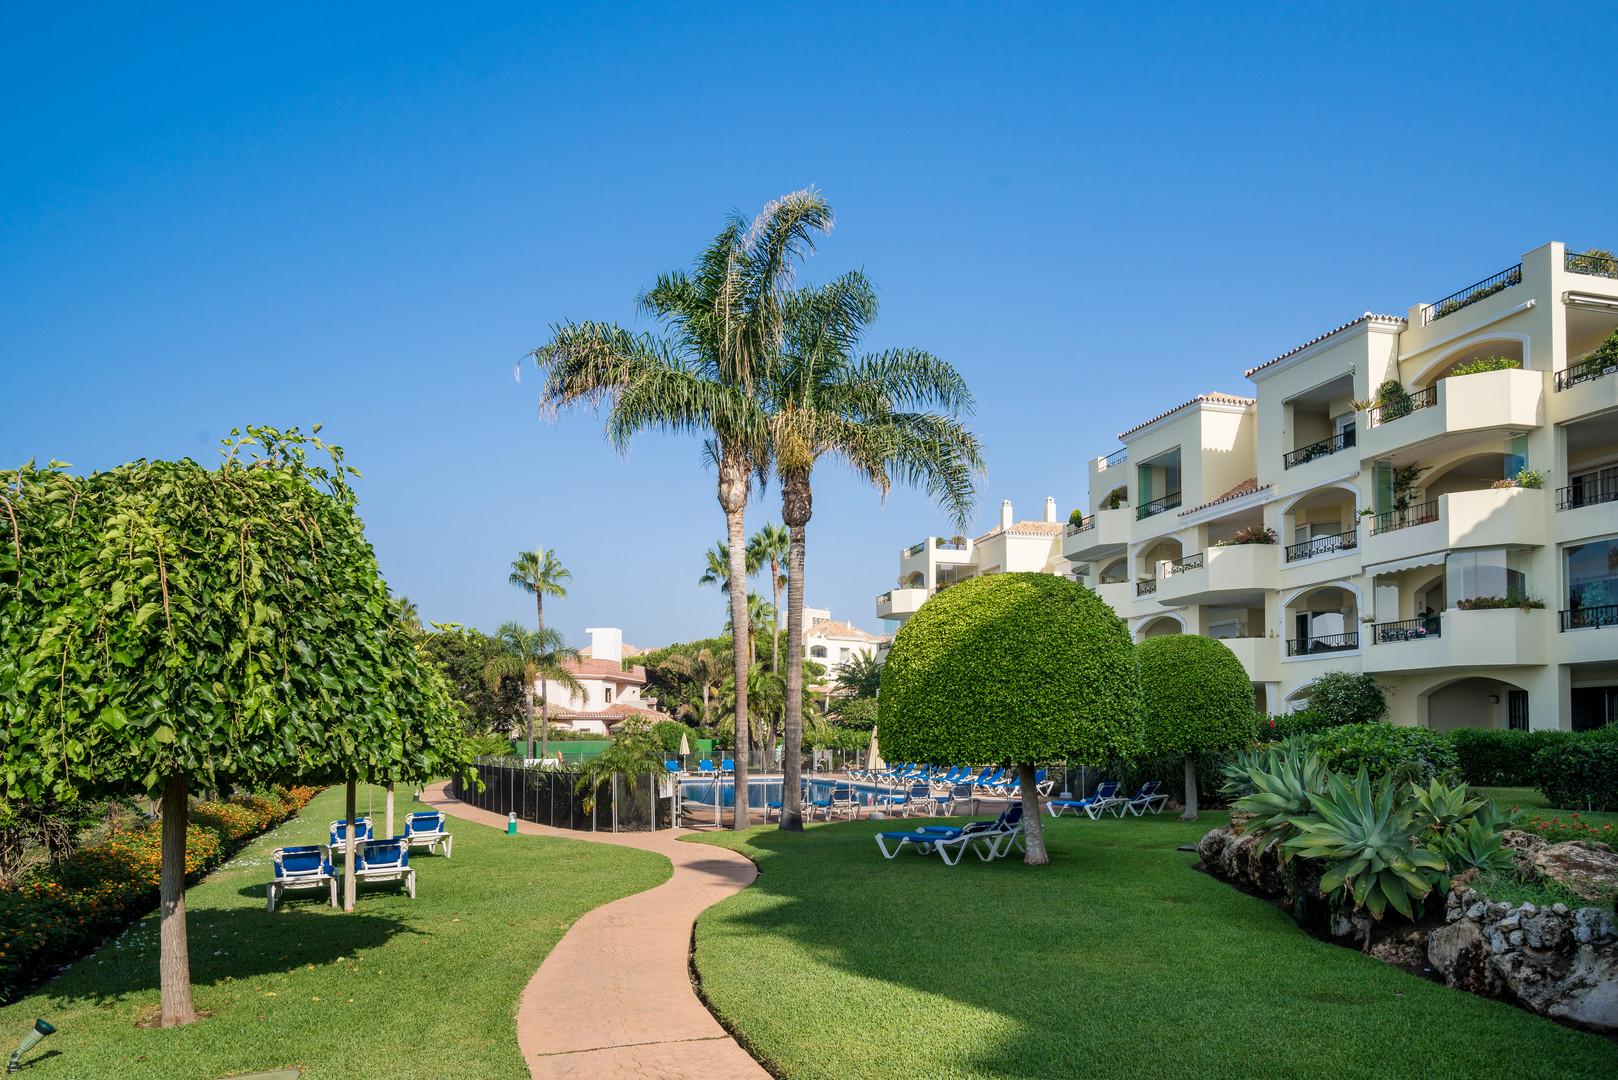 w94 gardens and pool hacienda playa fase